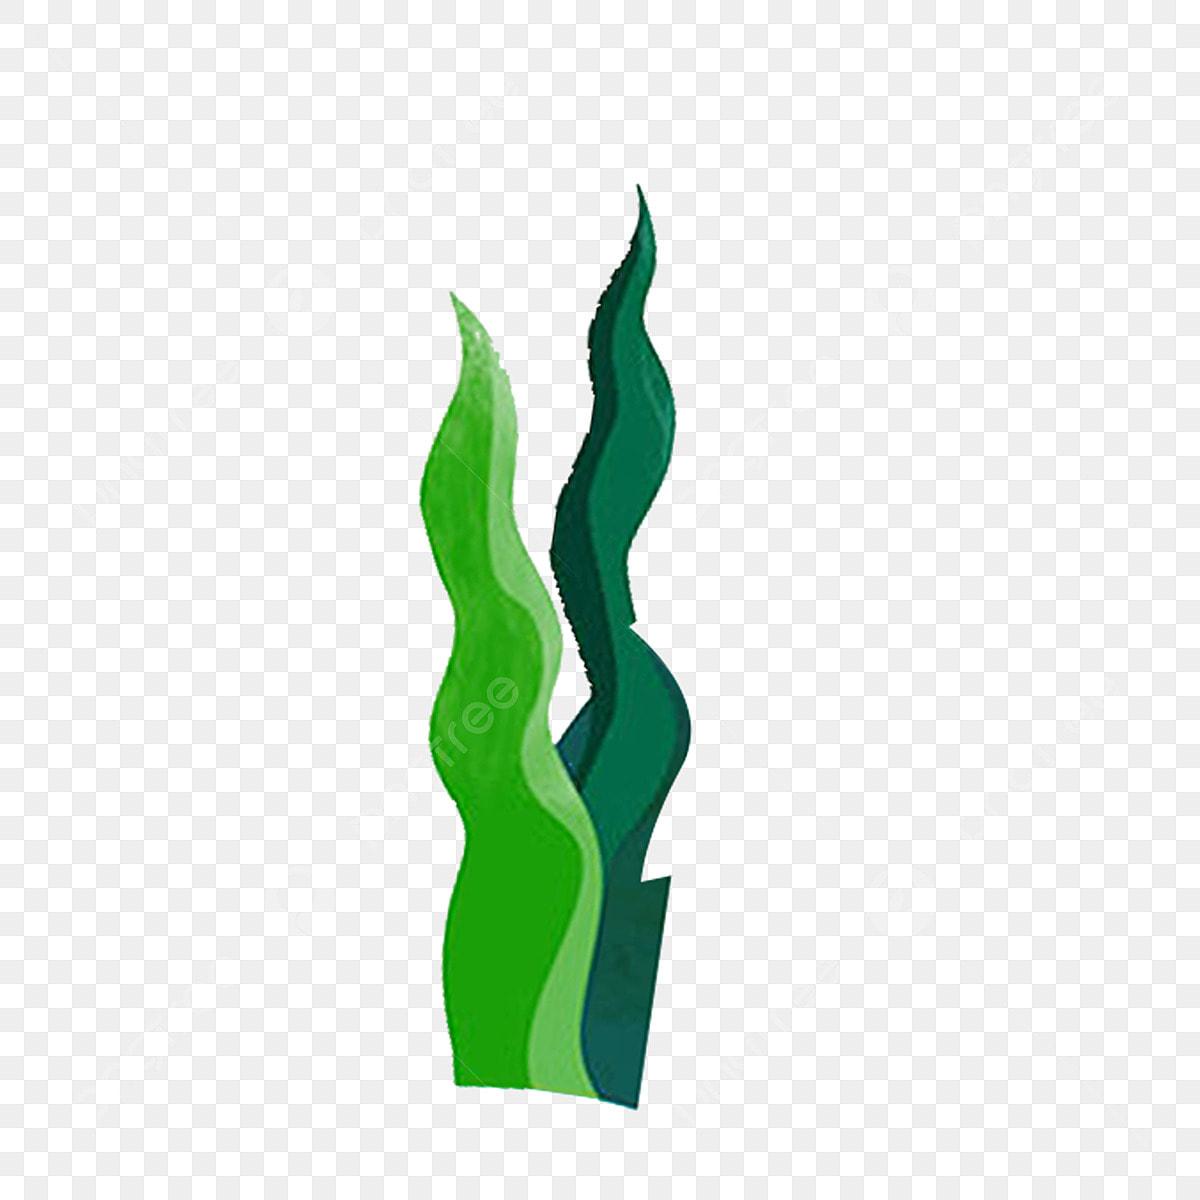 Rumput Tumbuhan Daun Hijau Rumpai Laut Ilustrasi Kartun